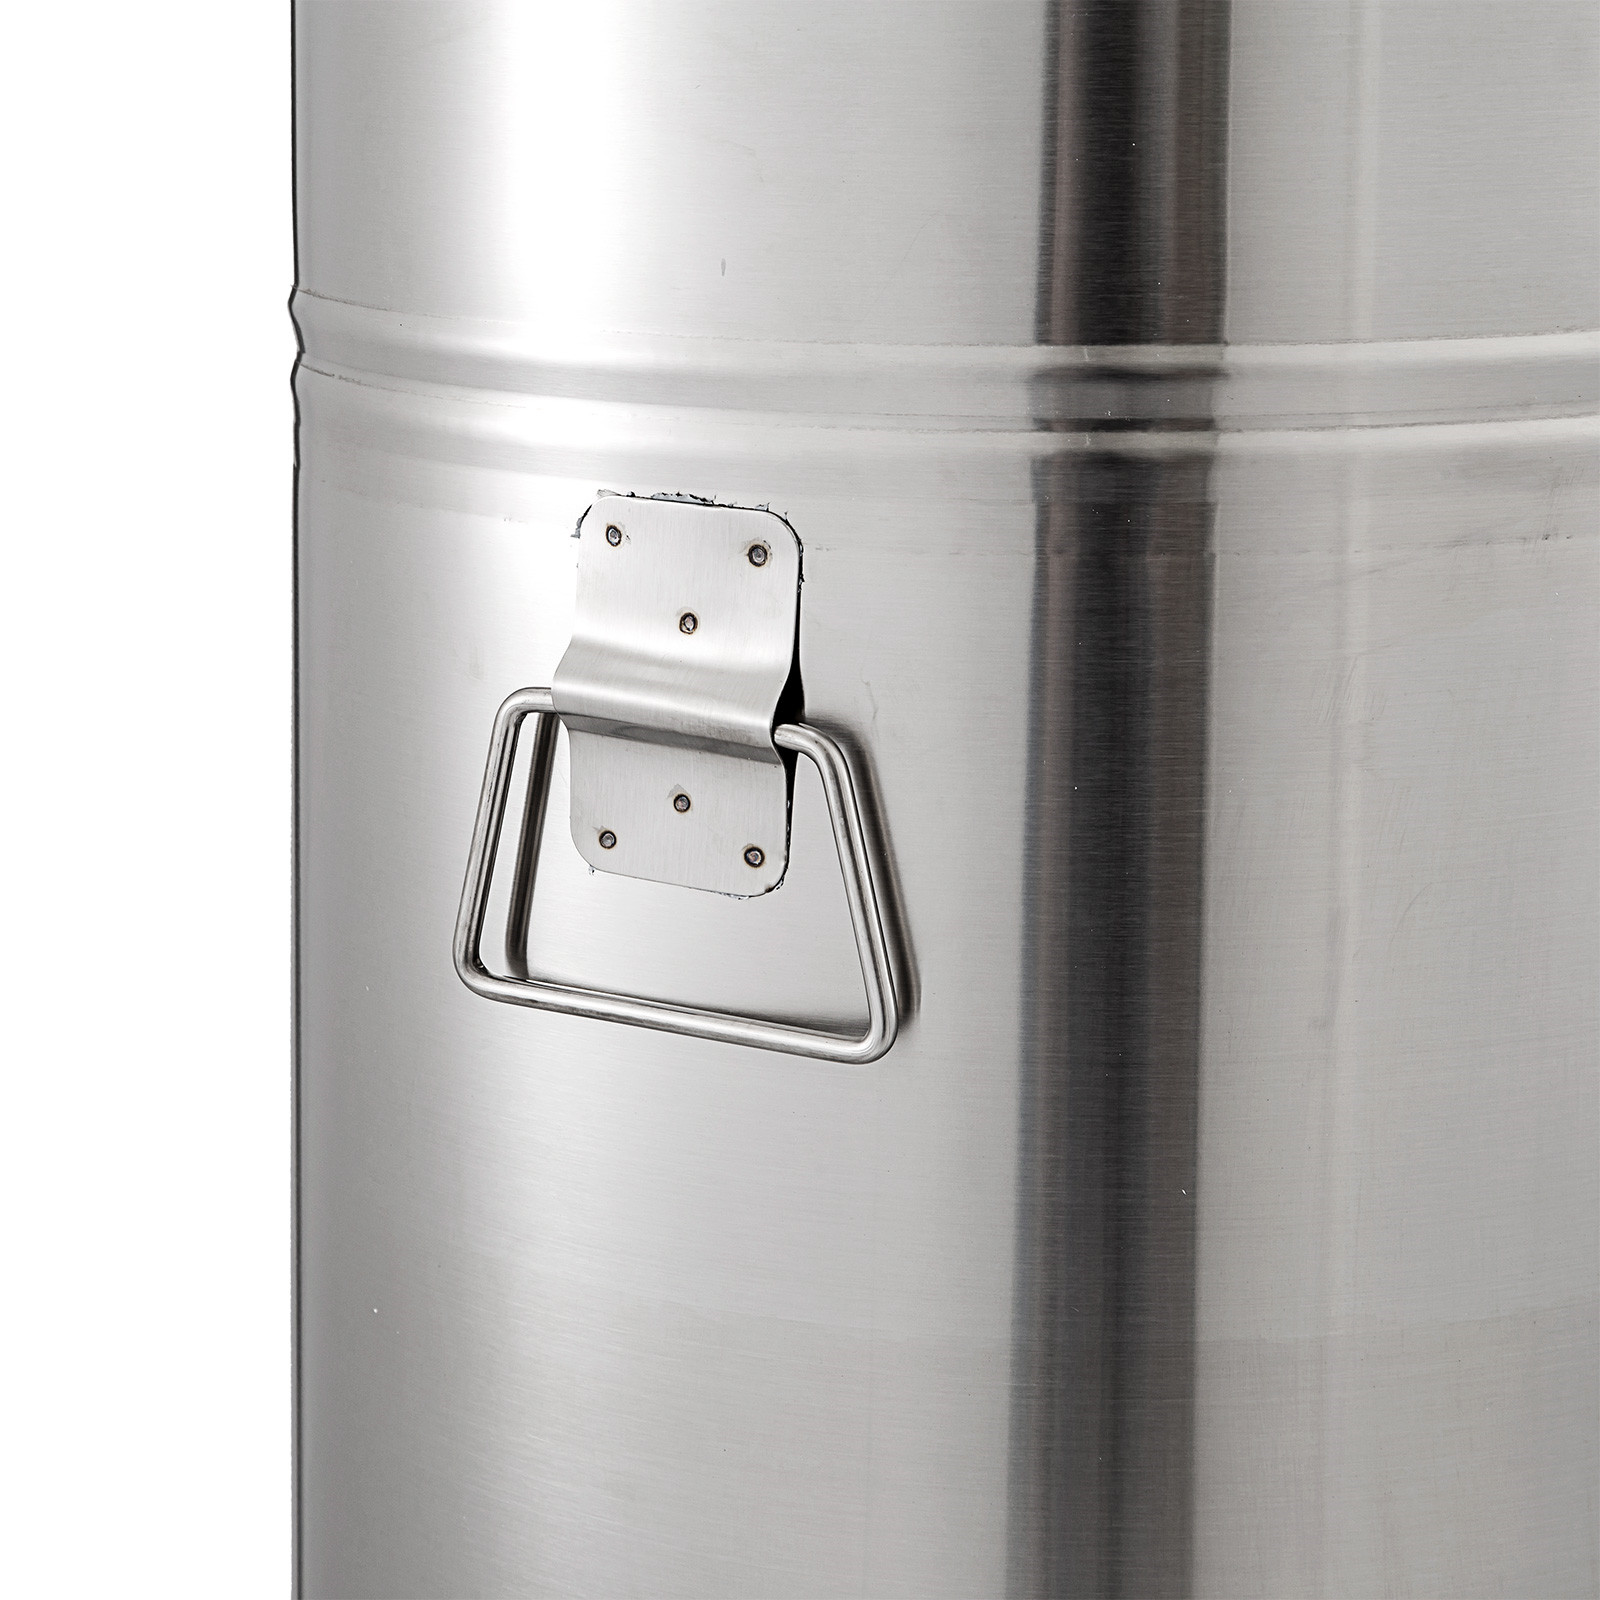 Extracteur-de-Miel-Electrique-manuelle-2-3-4-Cadres-En-Acier-Inox-Centrifugeuse miniature 24